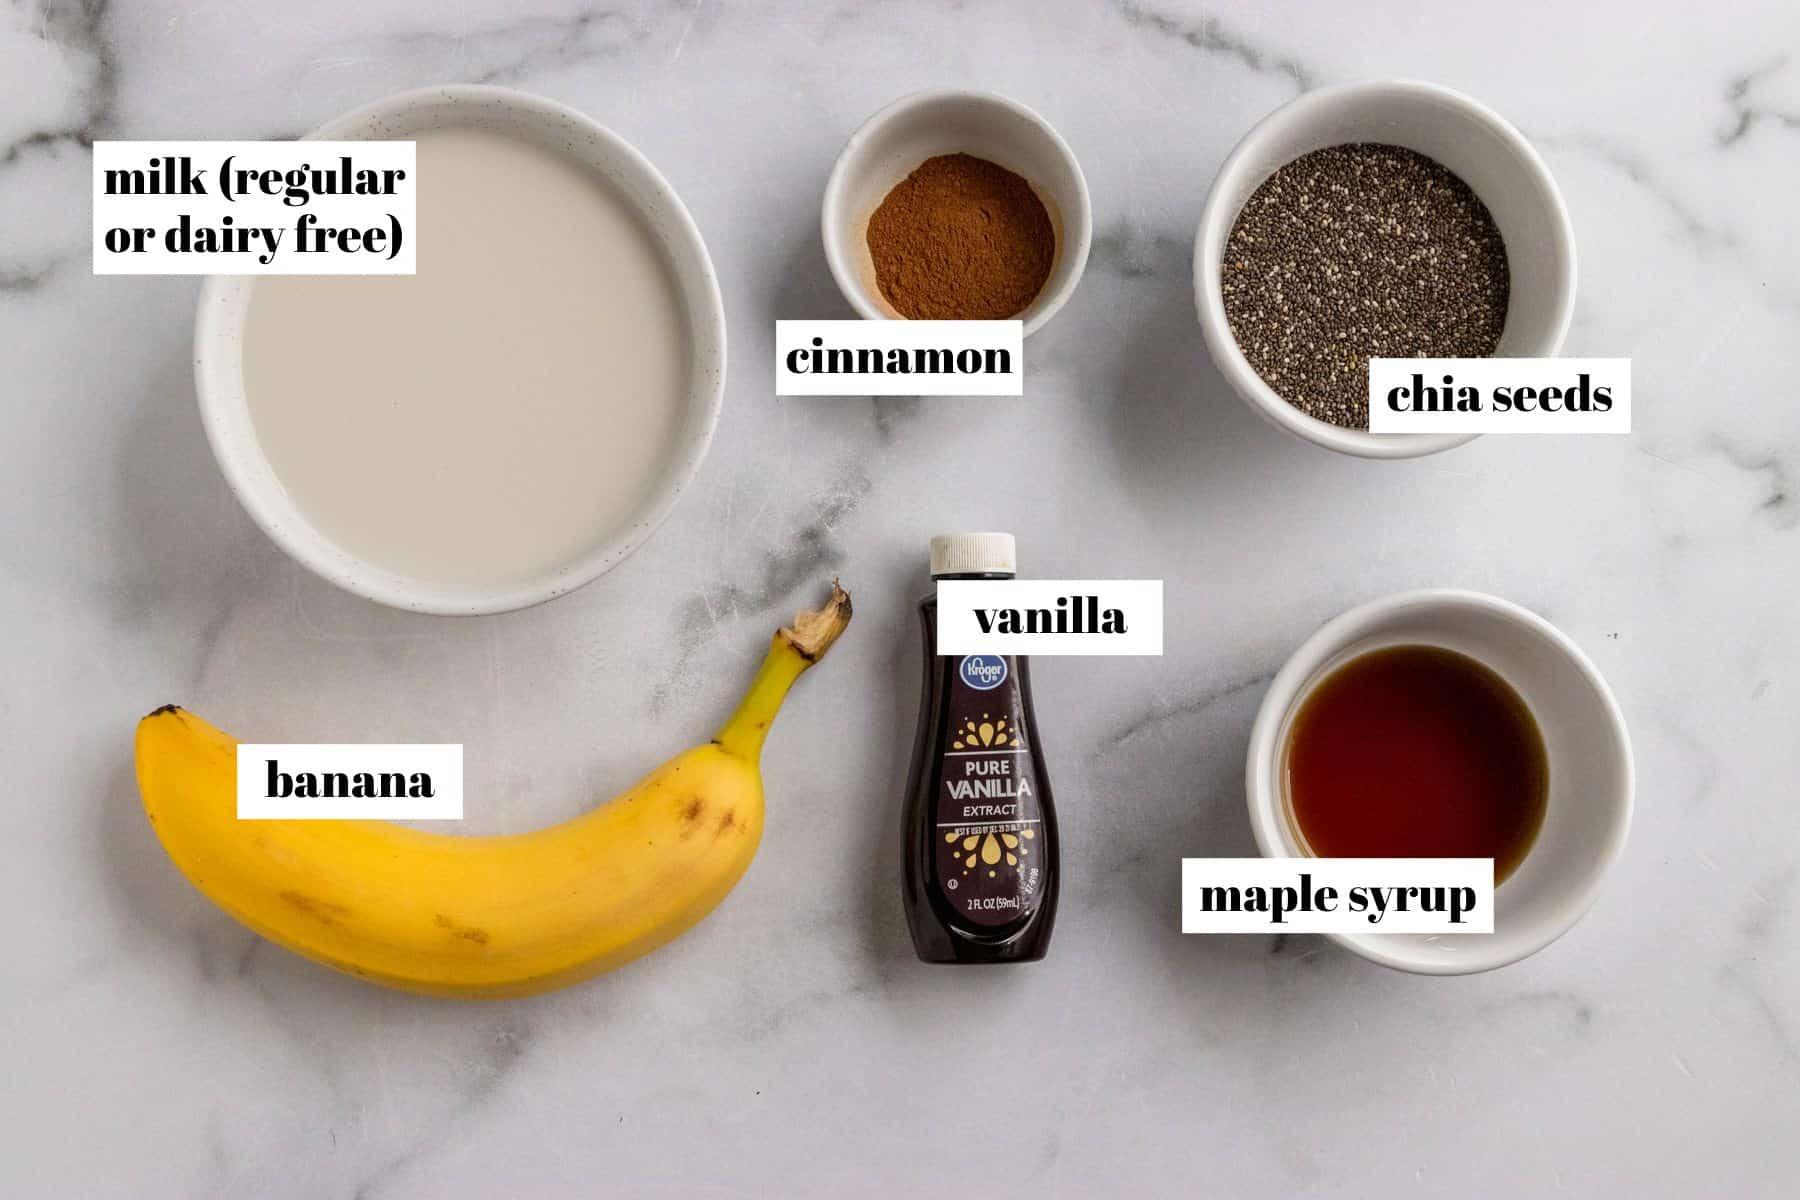 Ingredients to make recipe on counter.